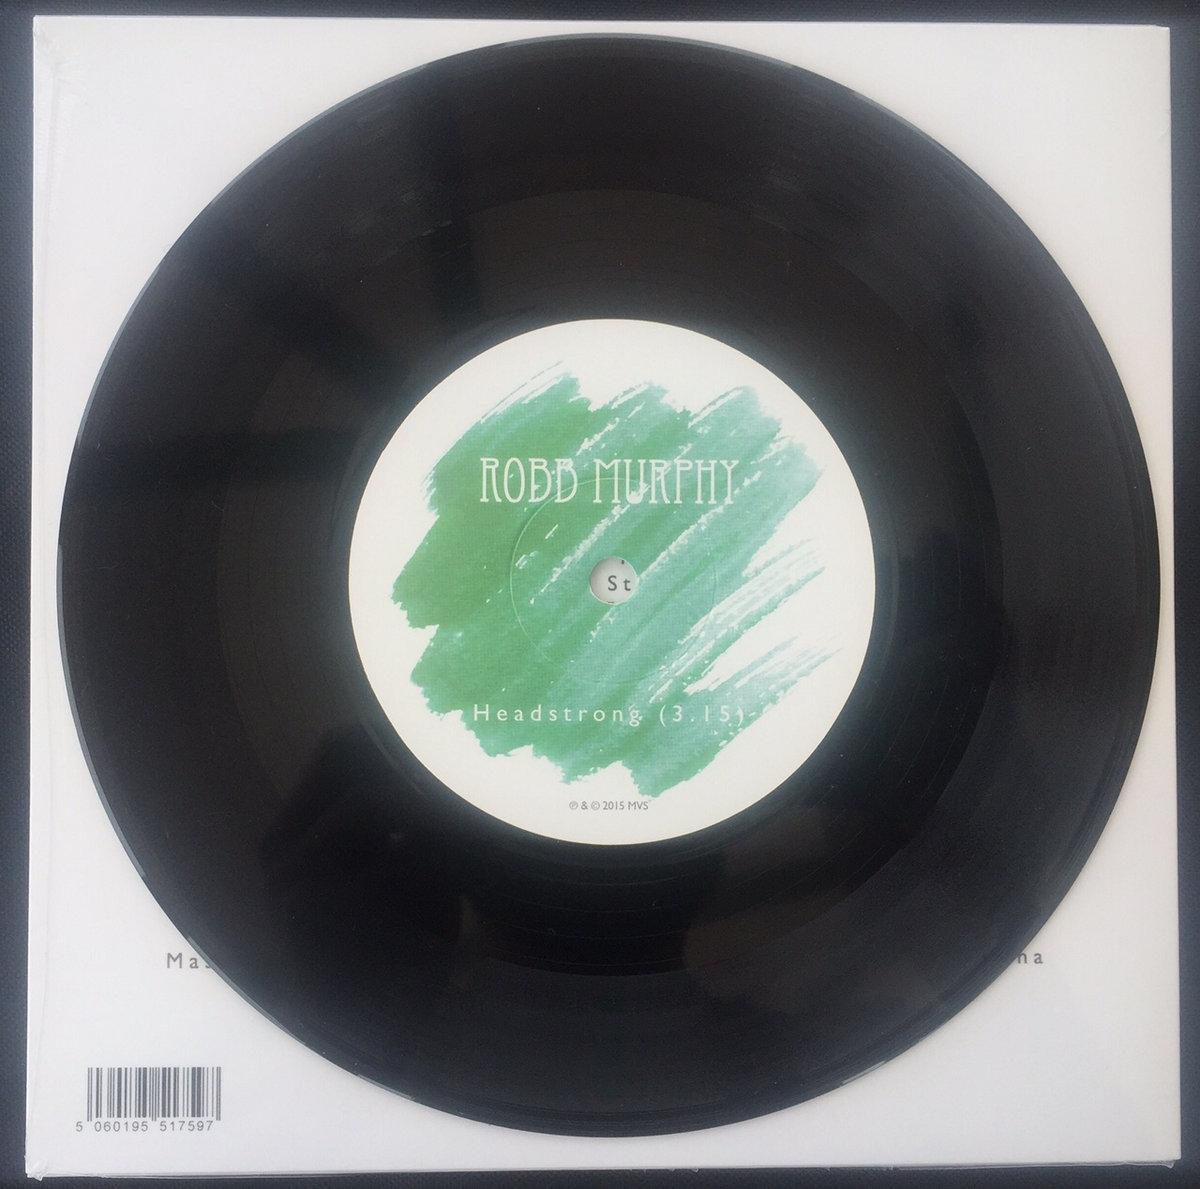 Headstrong feat. Kirsty hawkshaw – love calls (2008) [mp3.